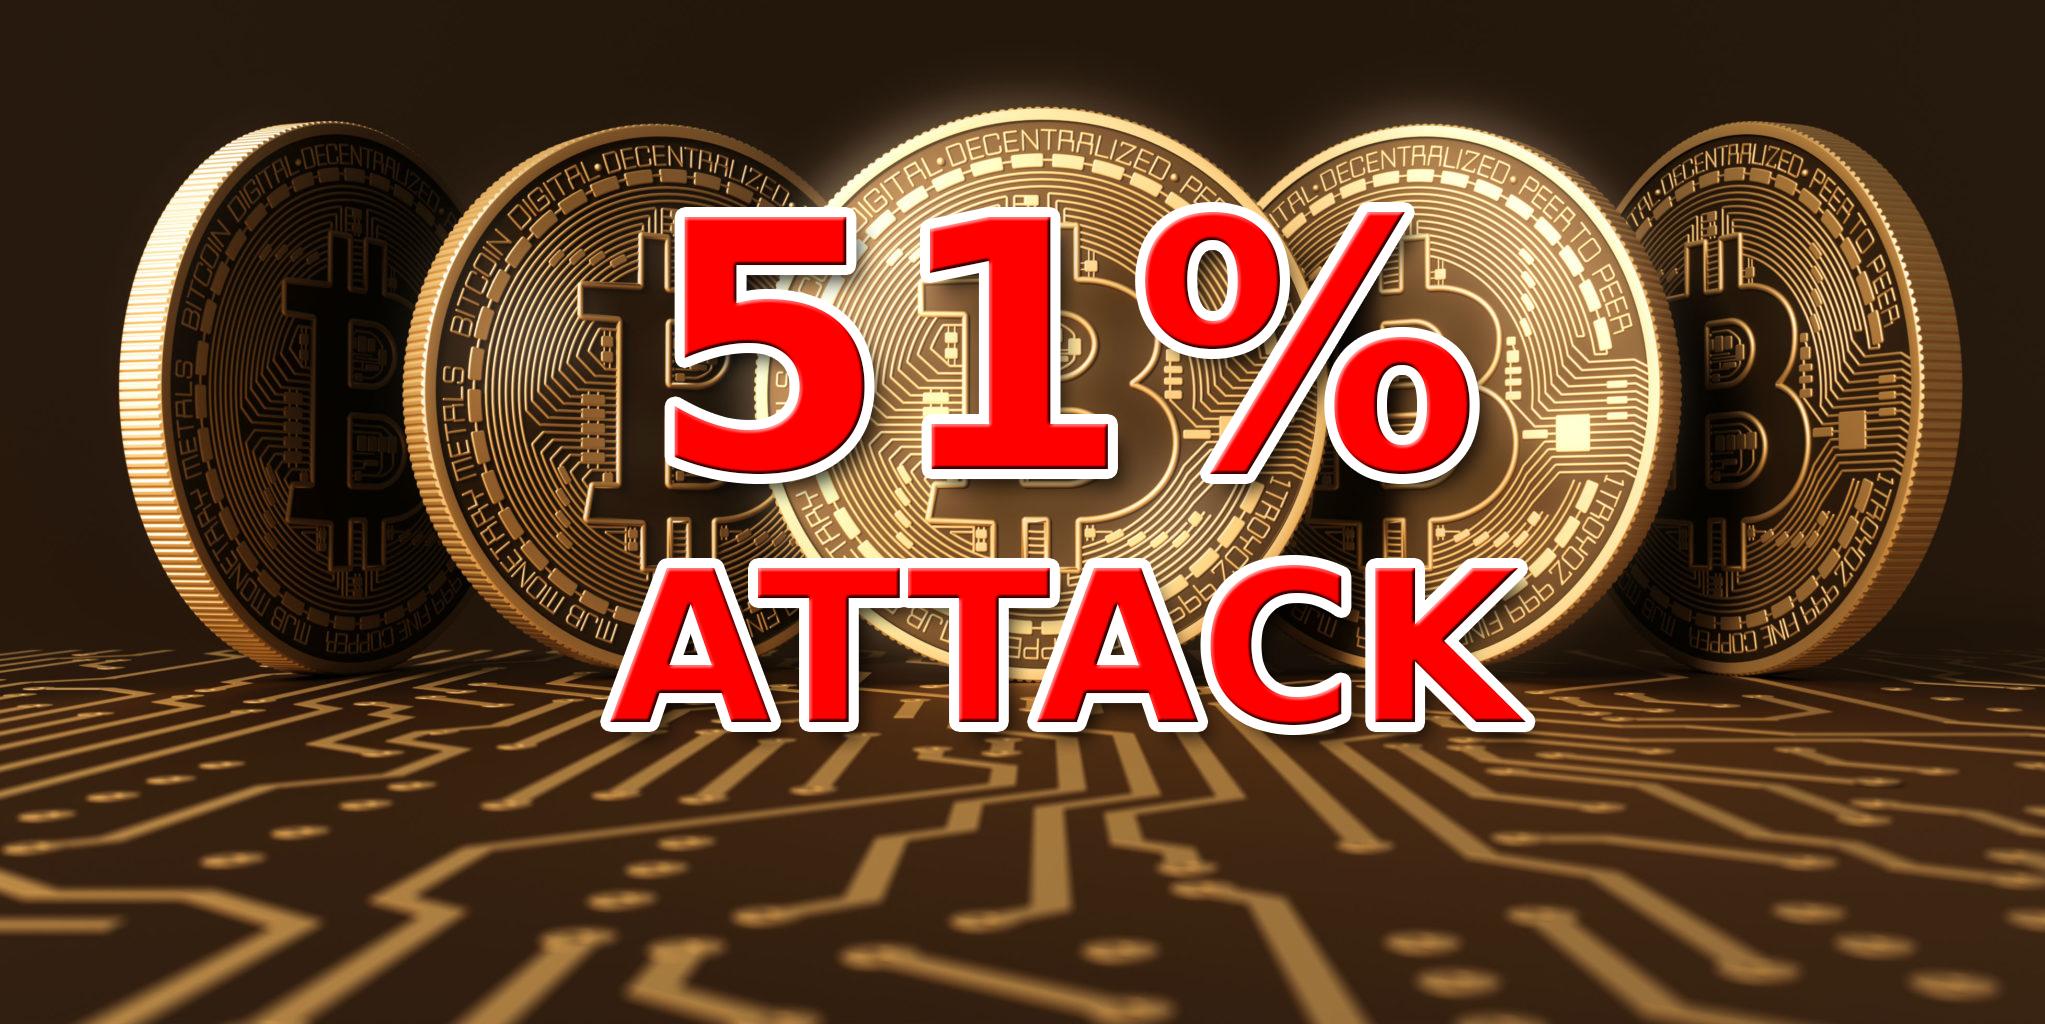 Bitcoin gold | 51% attack | Double spend attack | Cryptocurrency attack | Bitcoin gold attack | Bitcoin gold updates